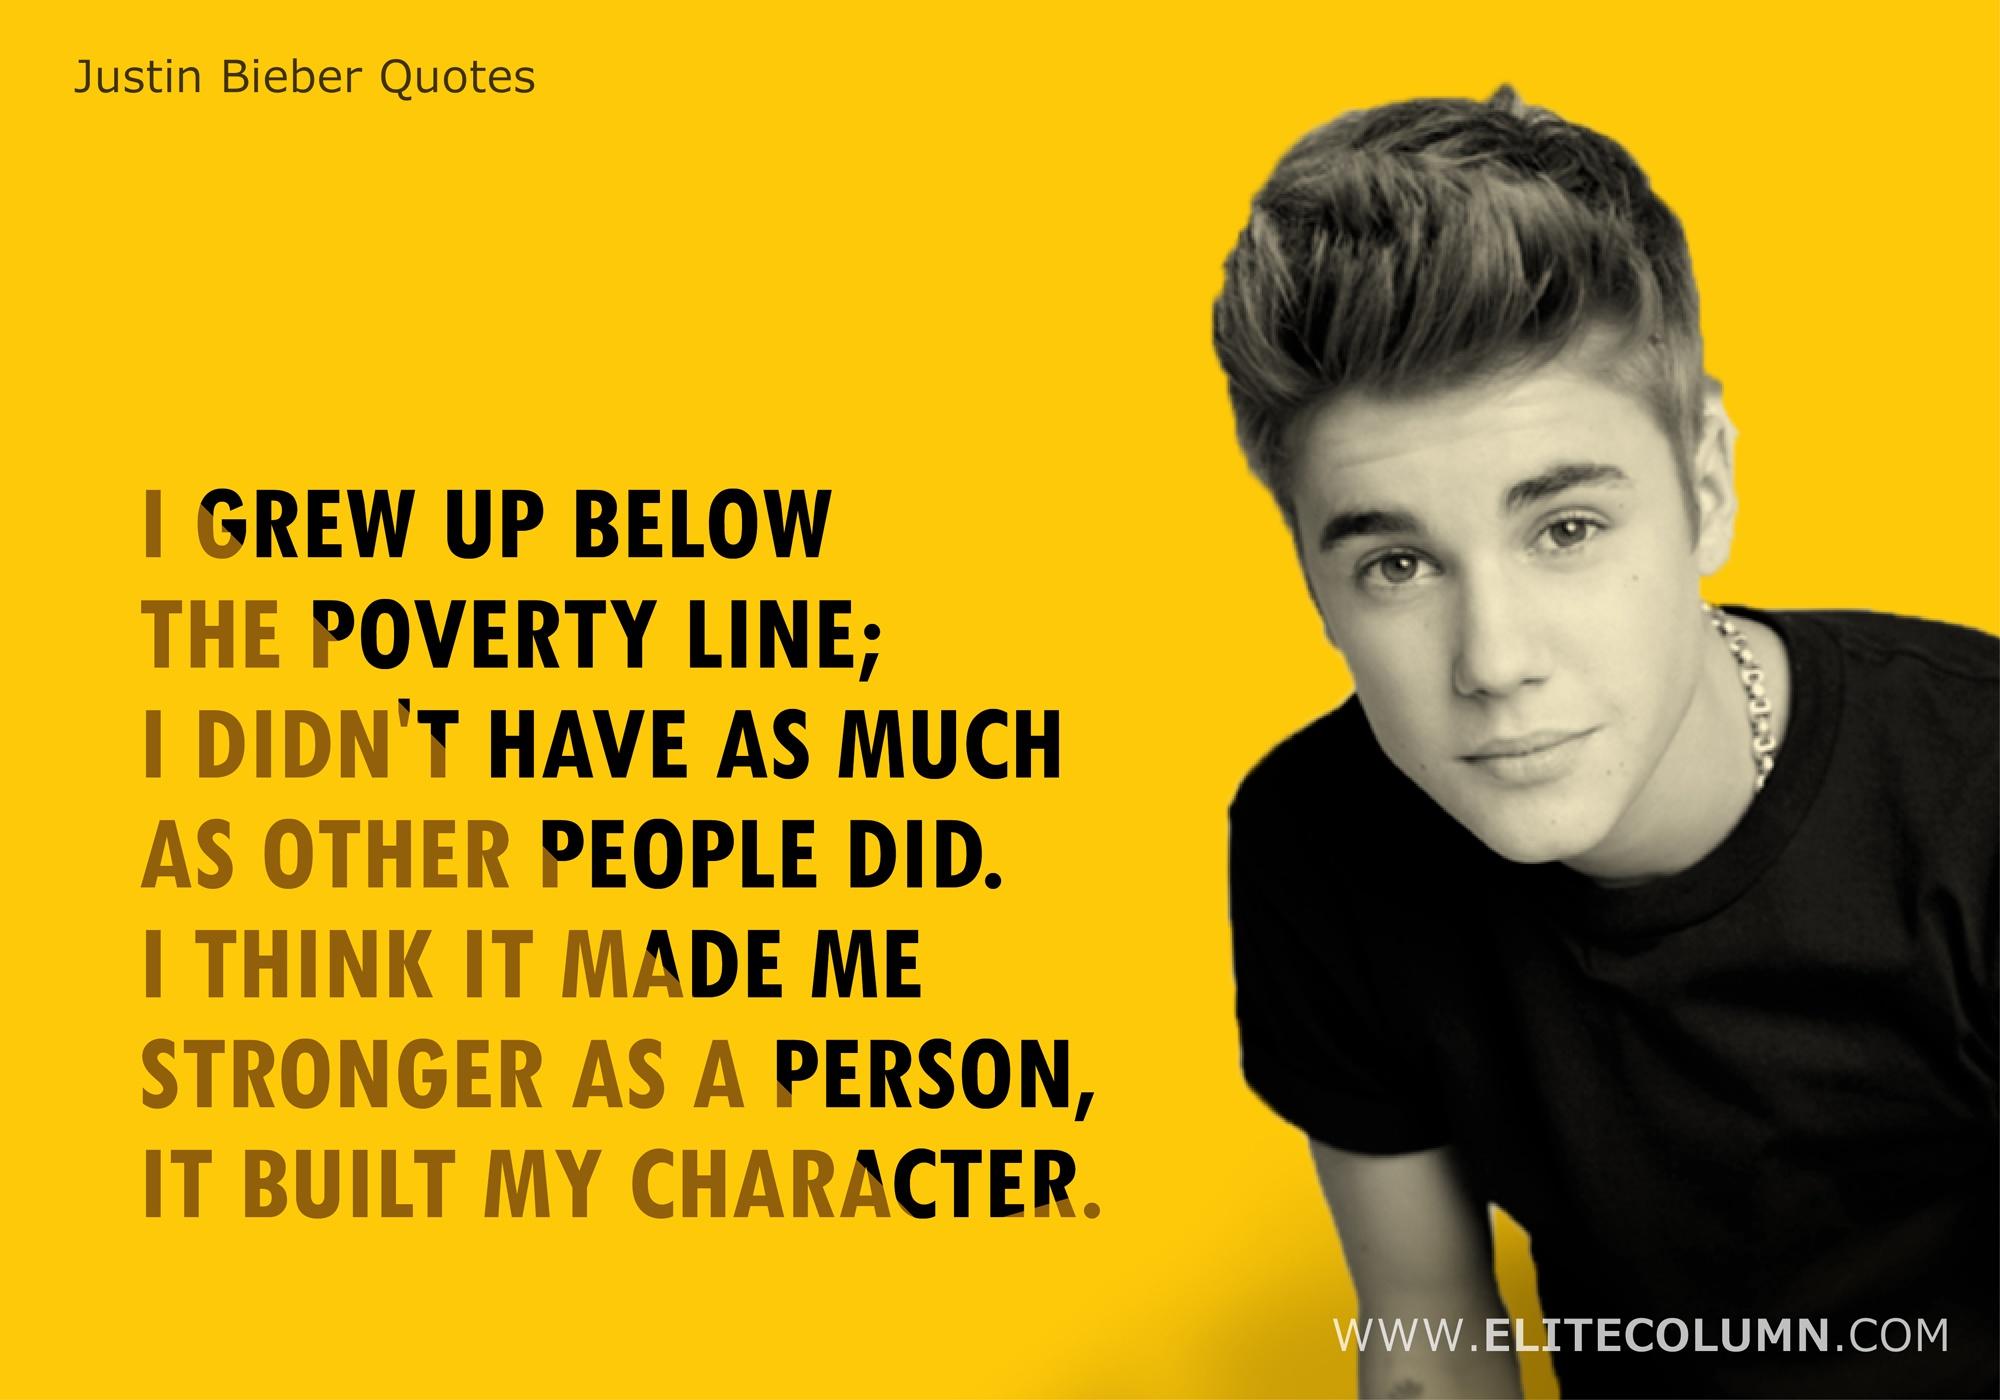 Justin Bieber Quotes (10)